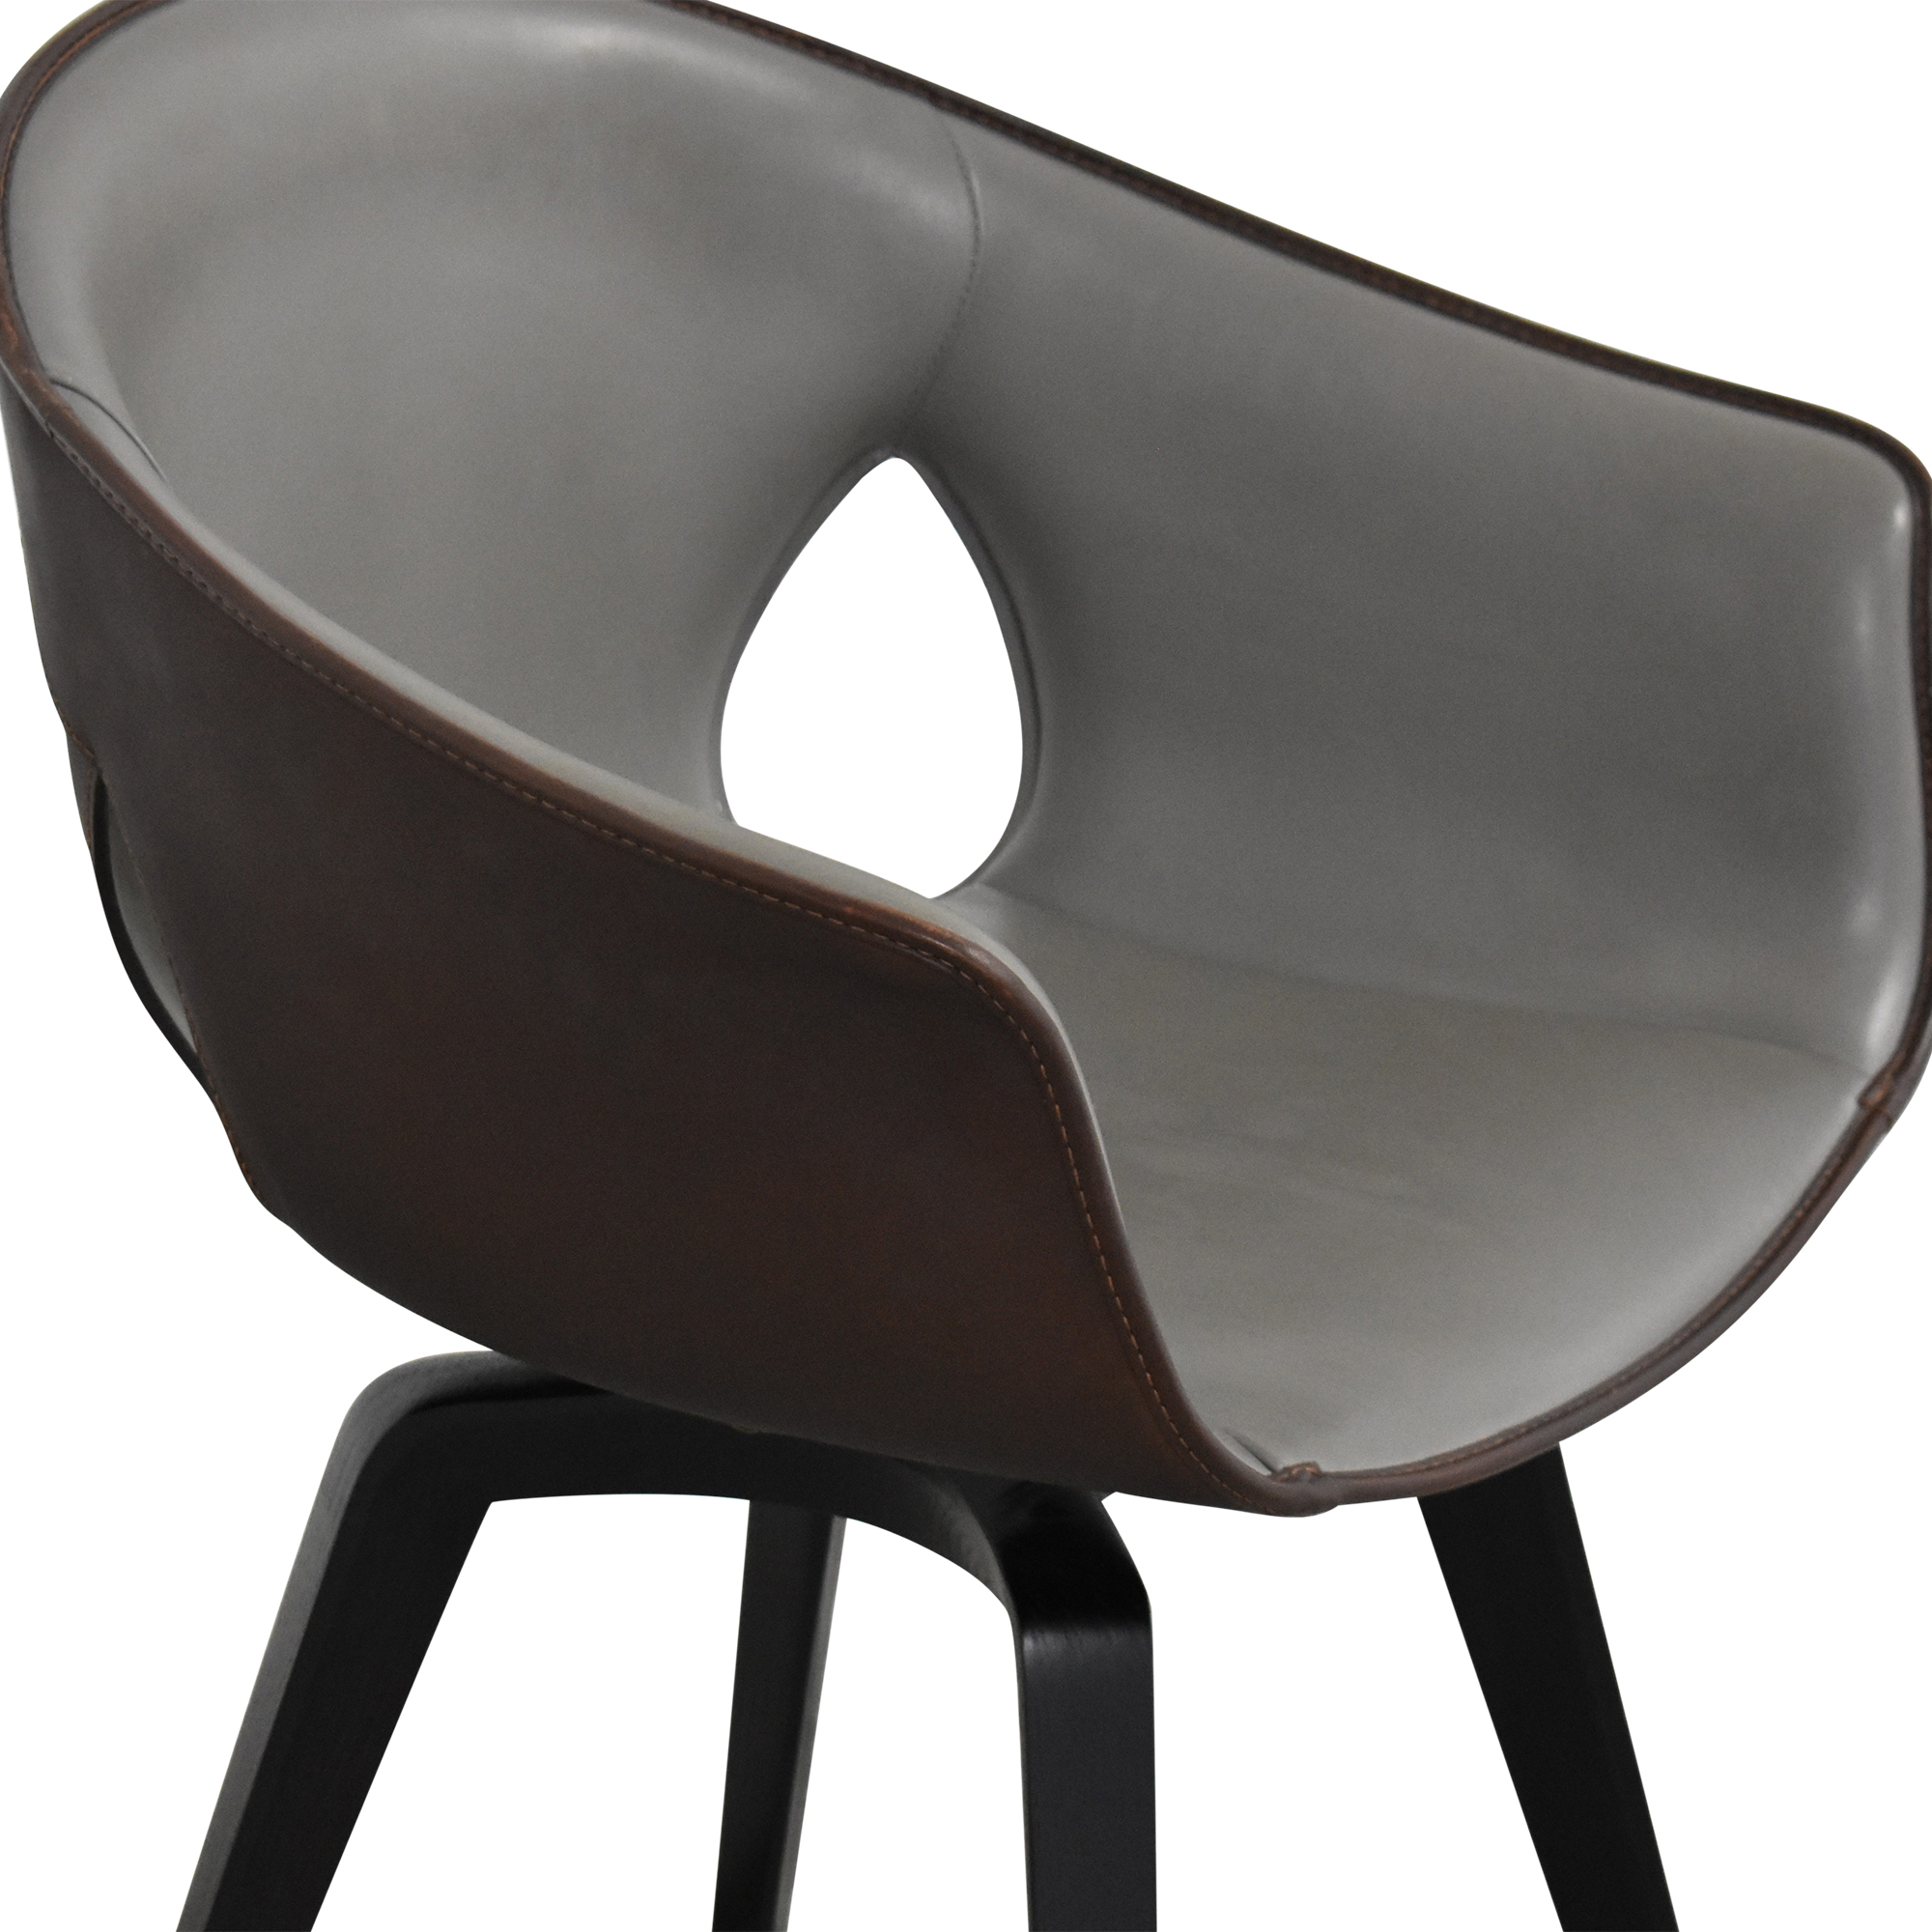 Poltrona Frau Ginger Side Chair sale